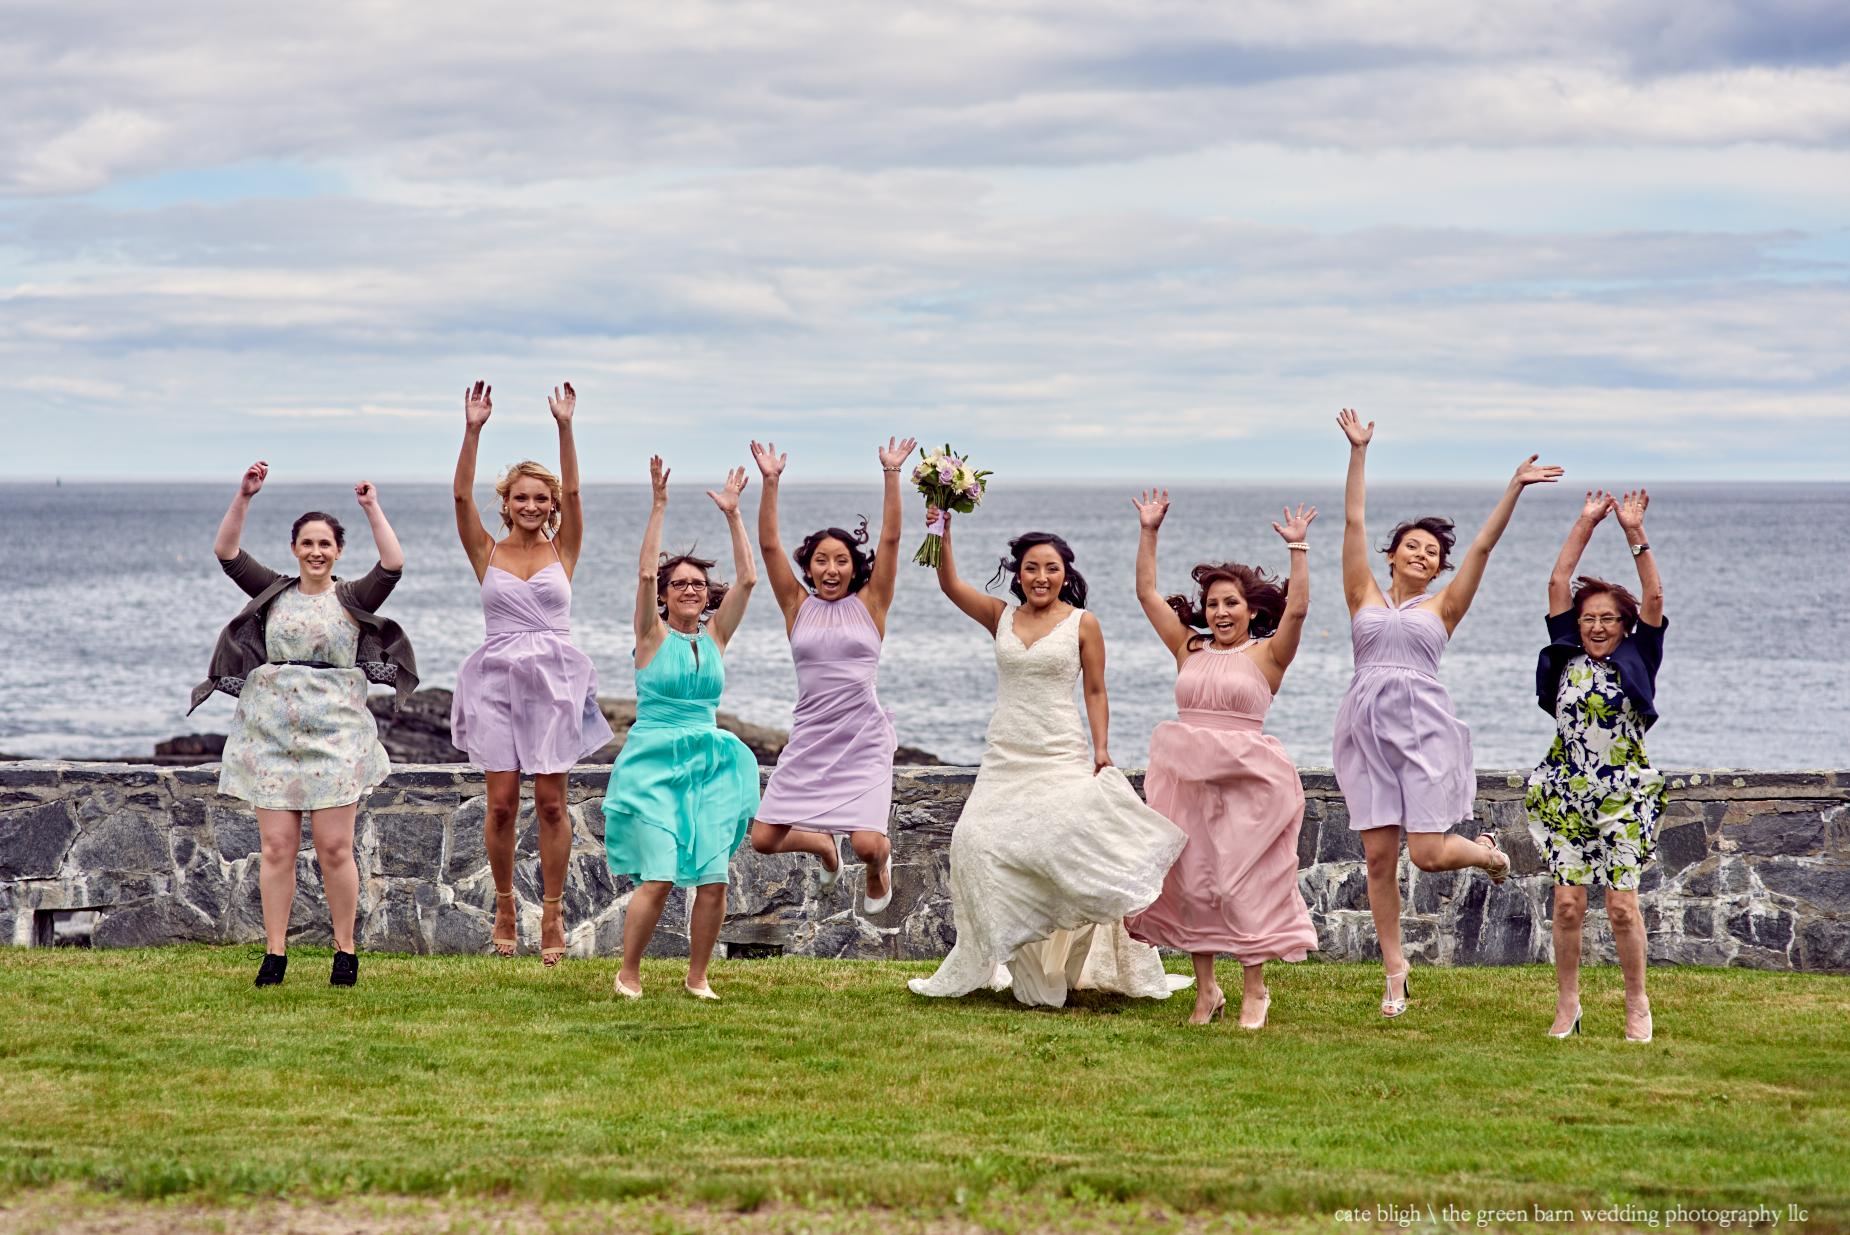 Bridesmaids fun photo ideas dream destination wedding Maine